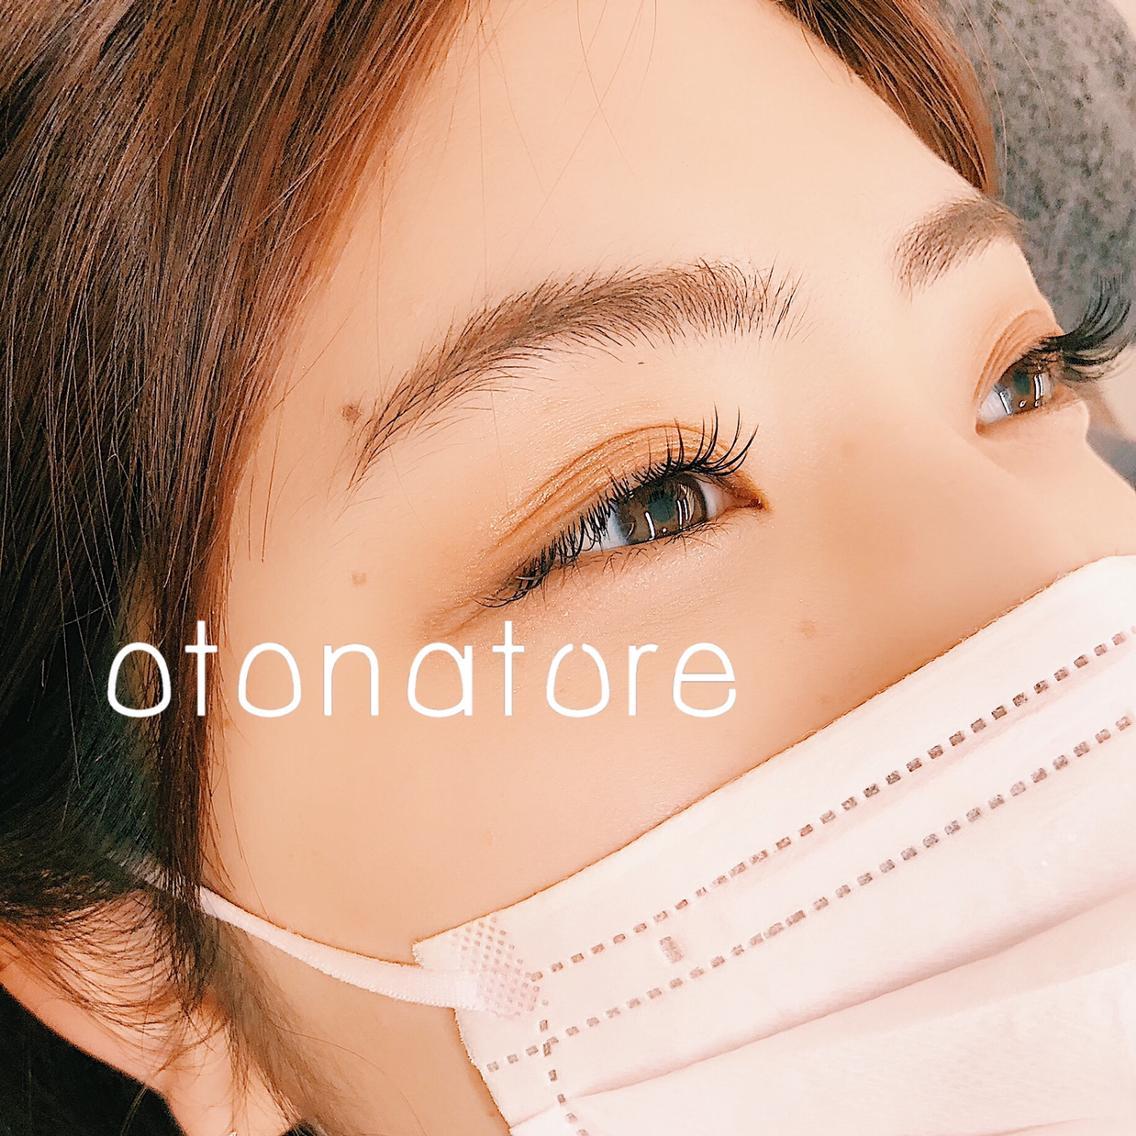 otonature所属・♥otonature ♥オトナチュールの掲載